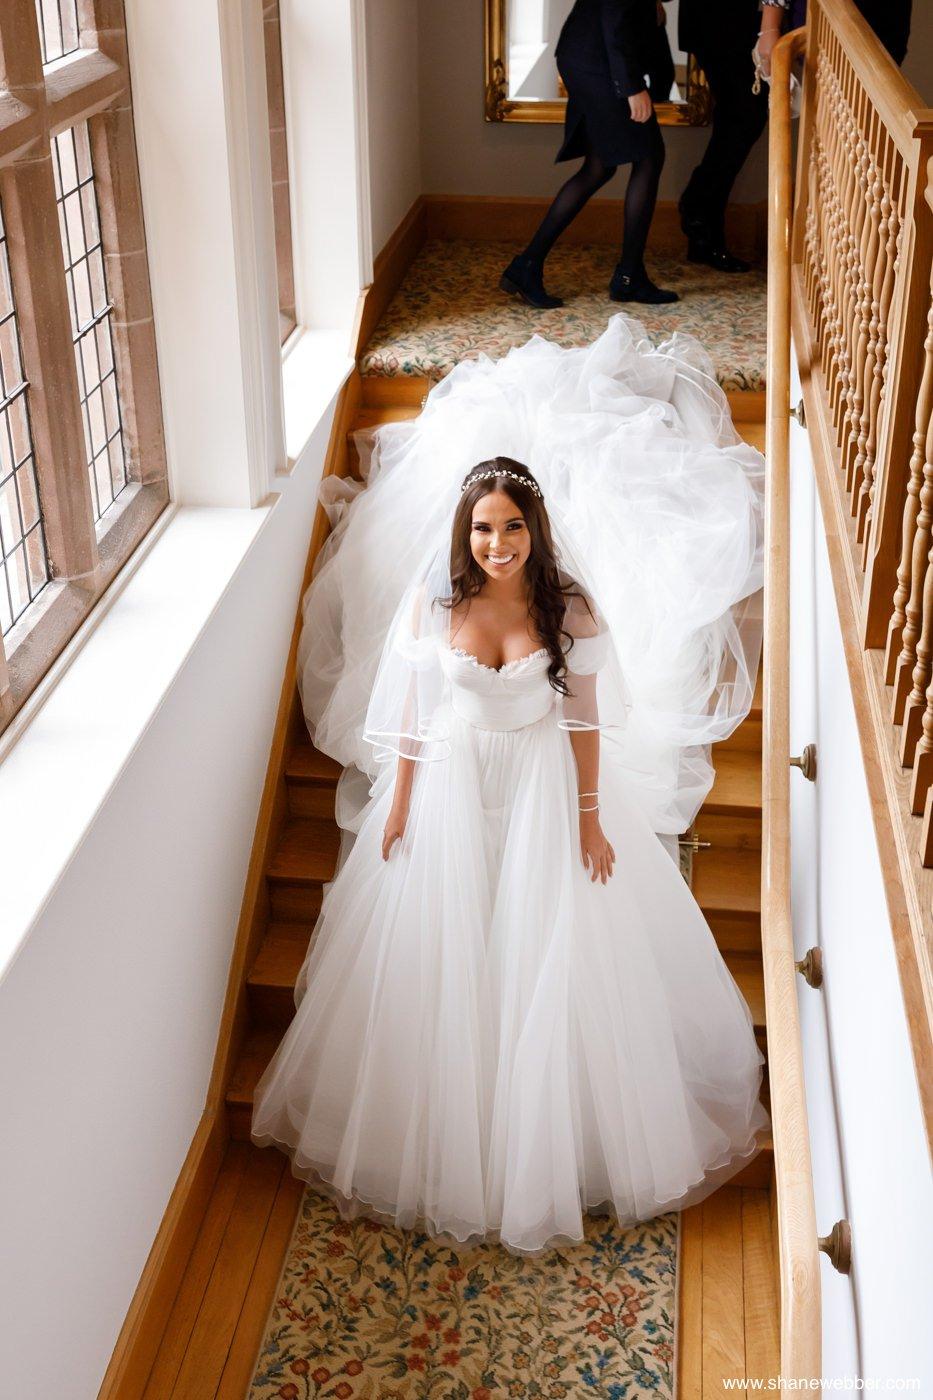 Bridal preparation photography at Colshaw Hall